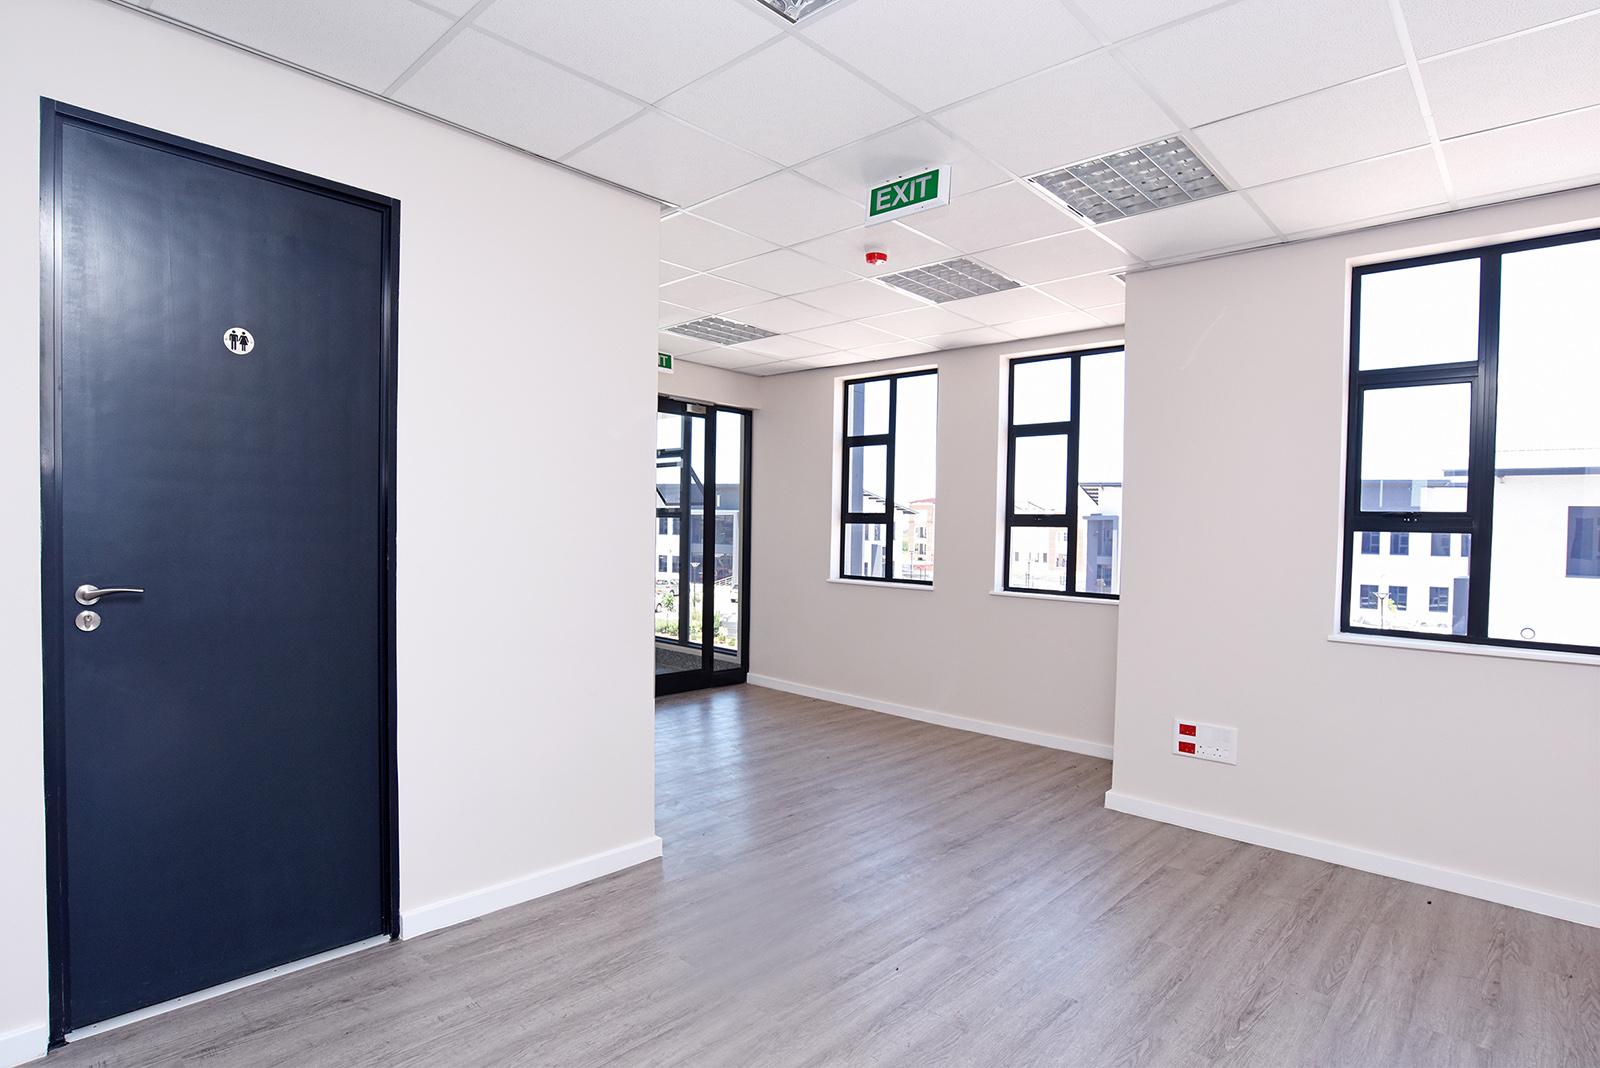 Modern Office For Rent In Sethloa, Gaborone